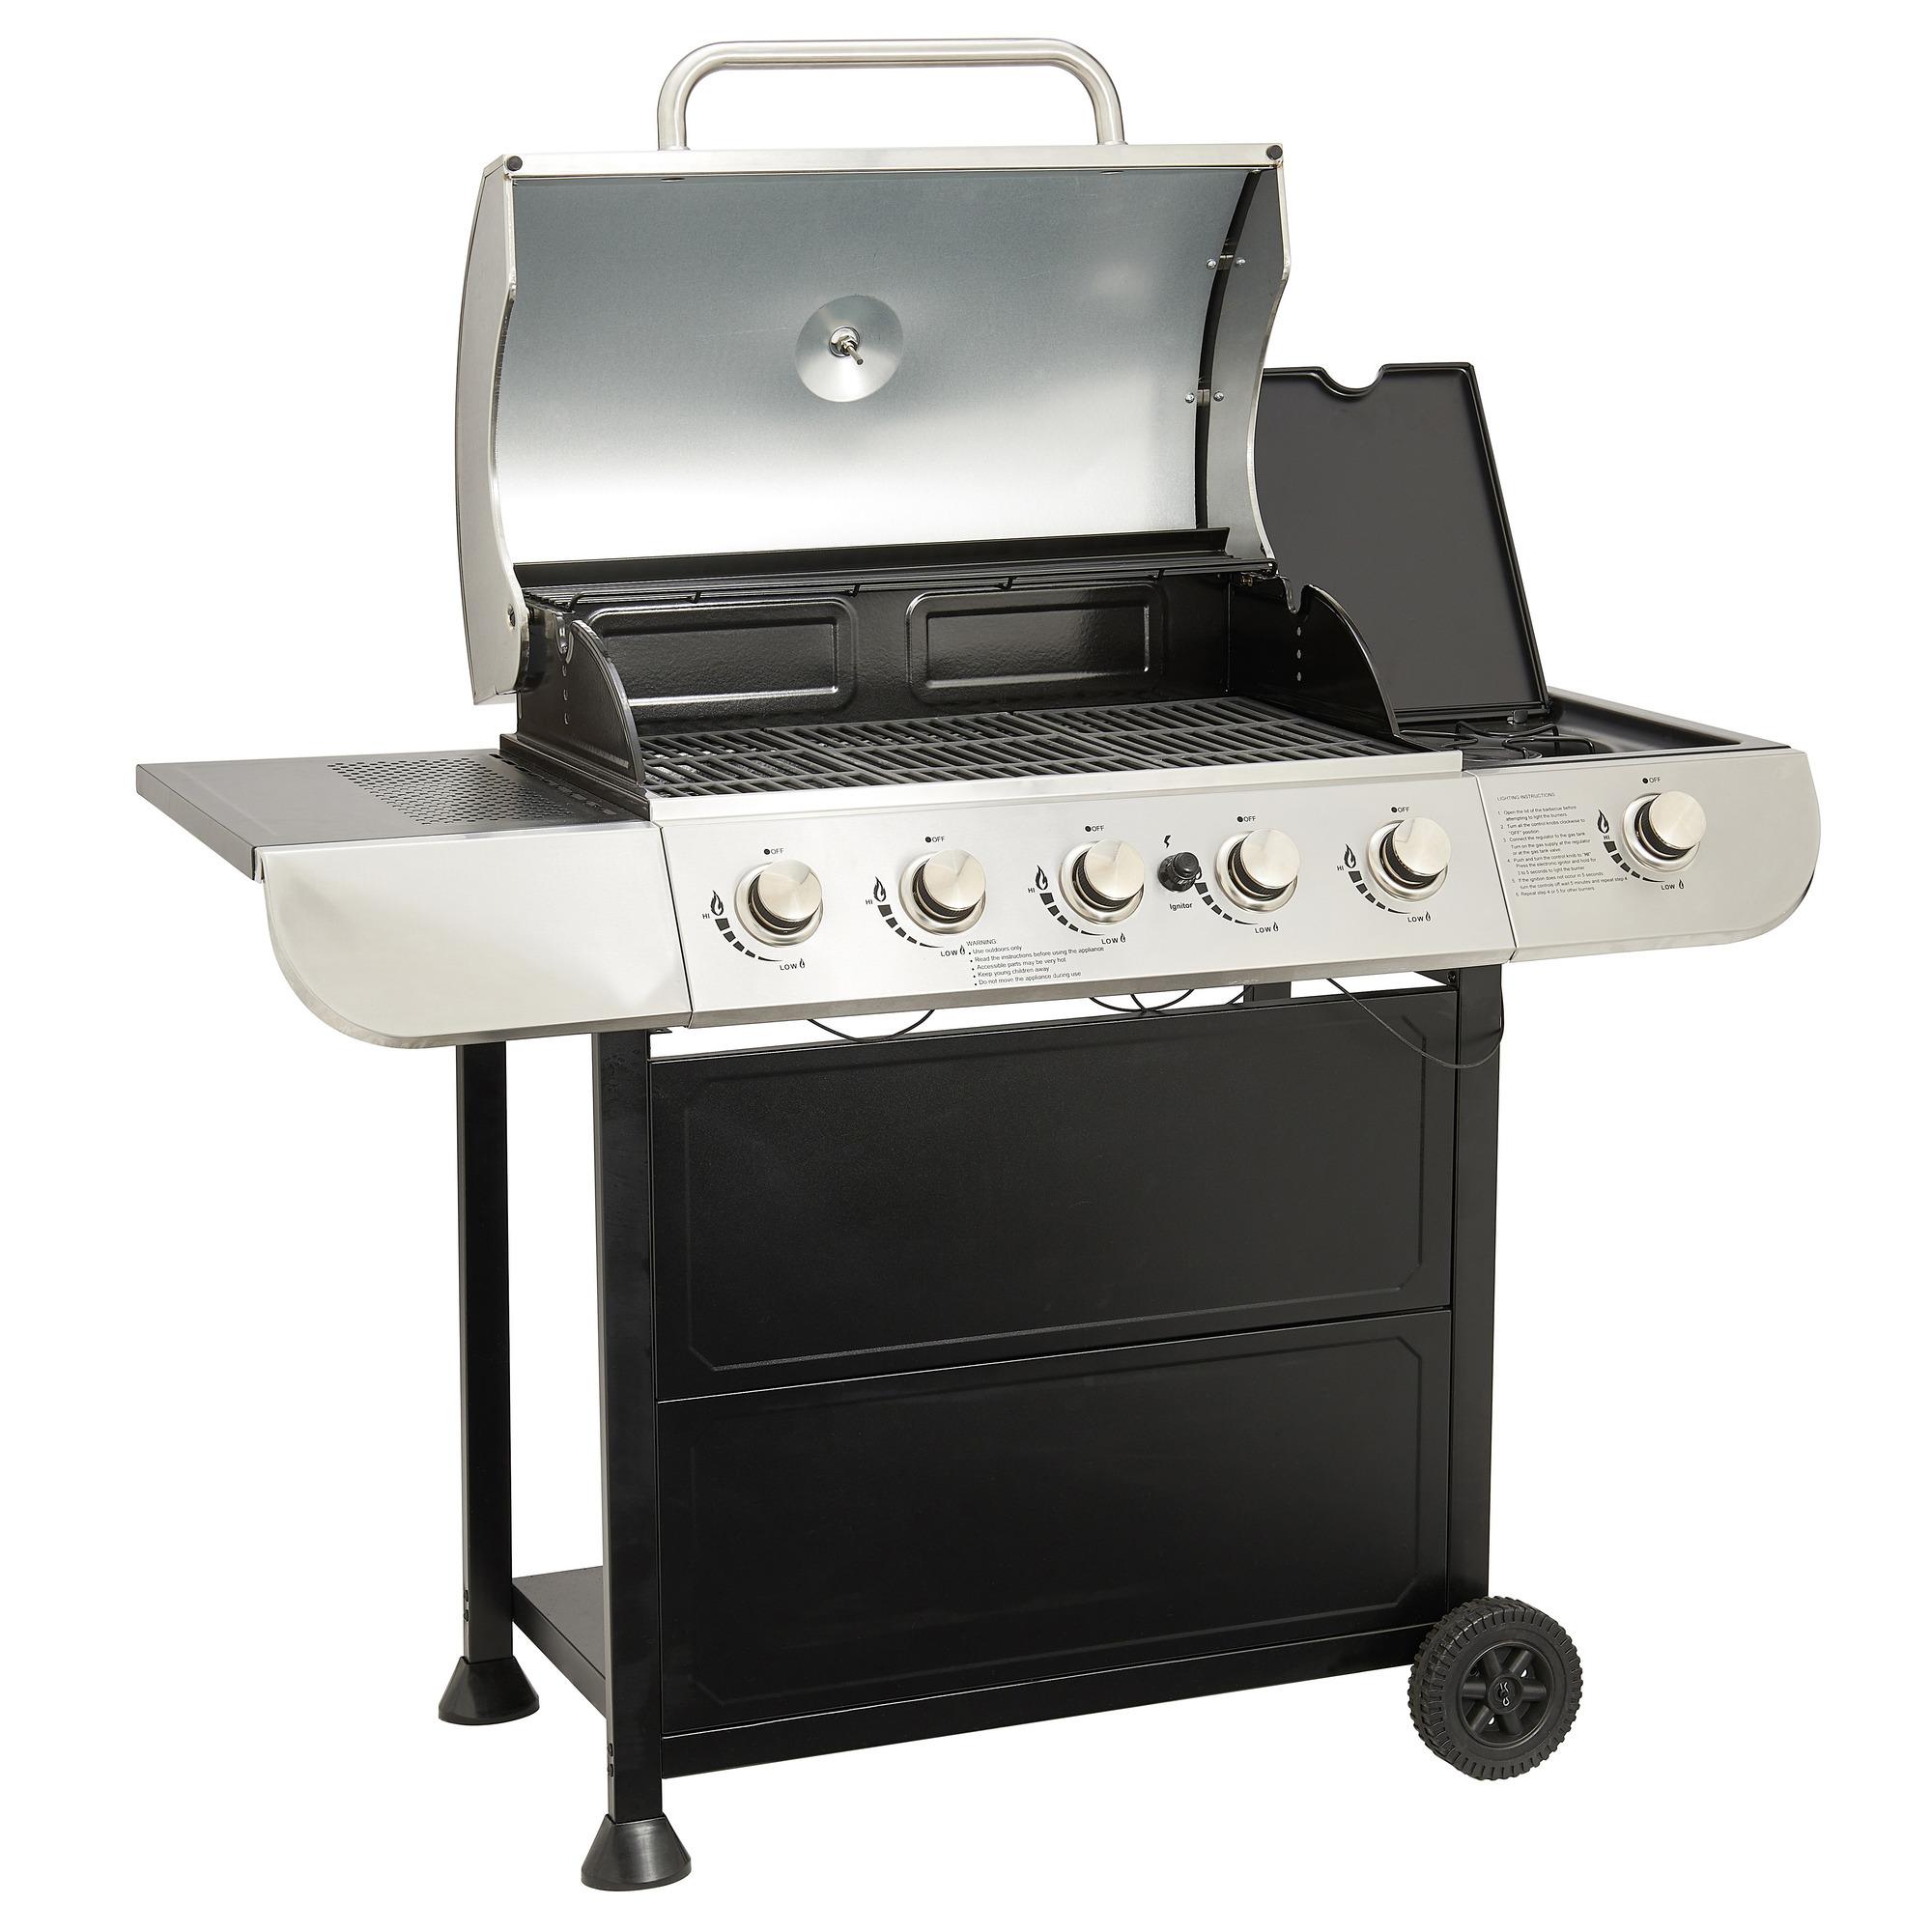 Carrefour Barbecue Gaz 5 1 Feux Kentucky Pas Cher